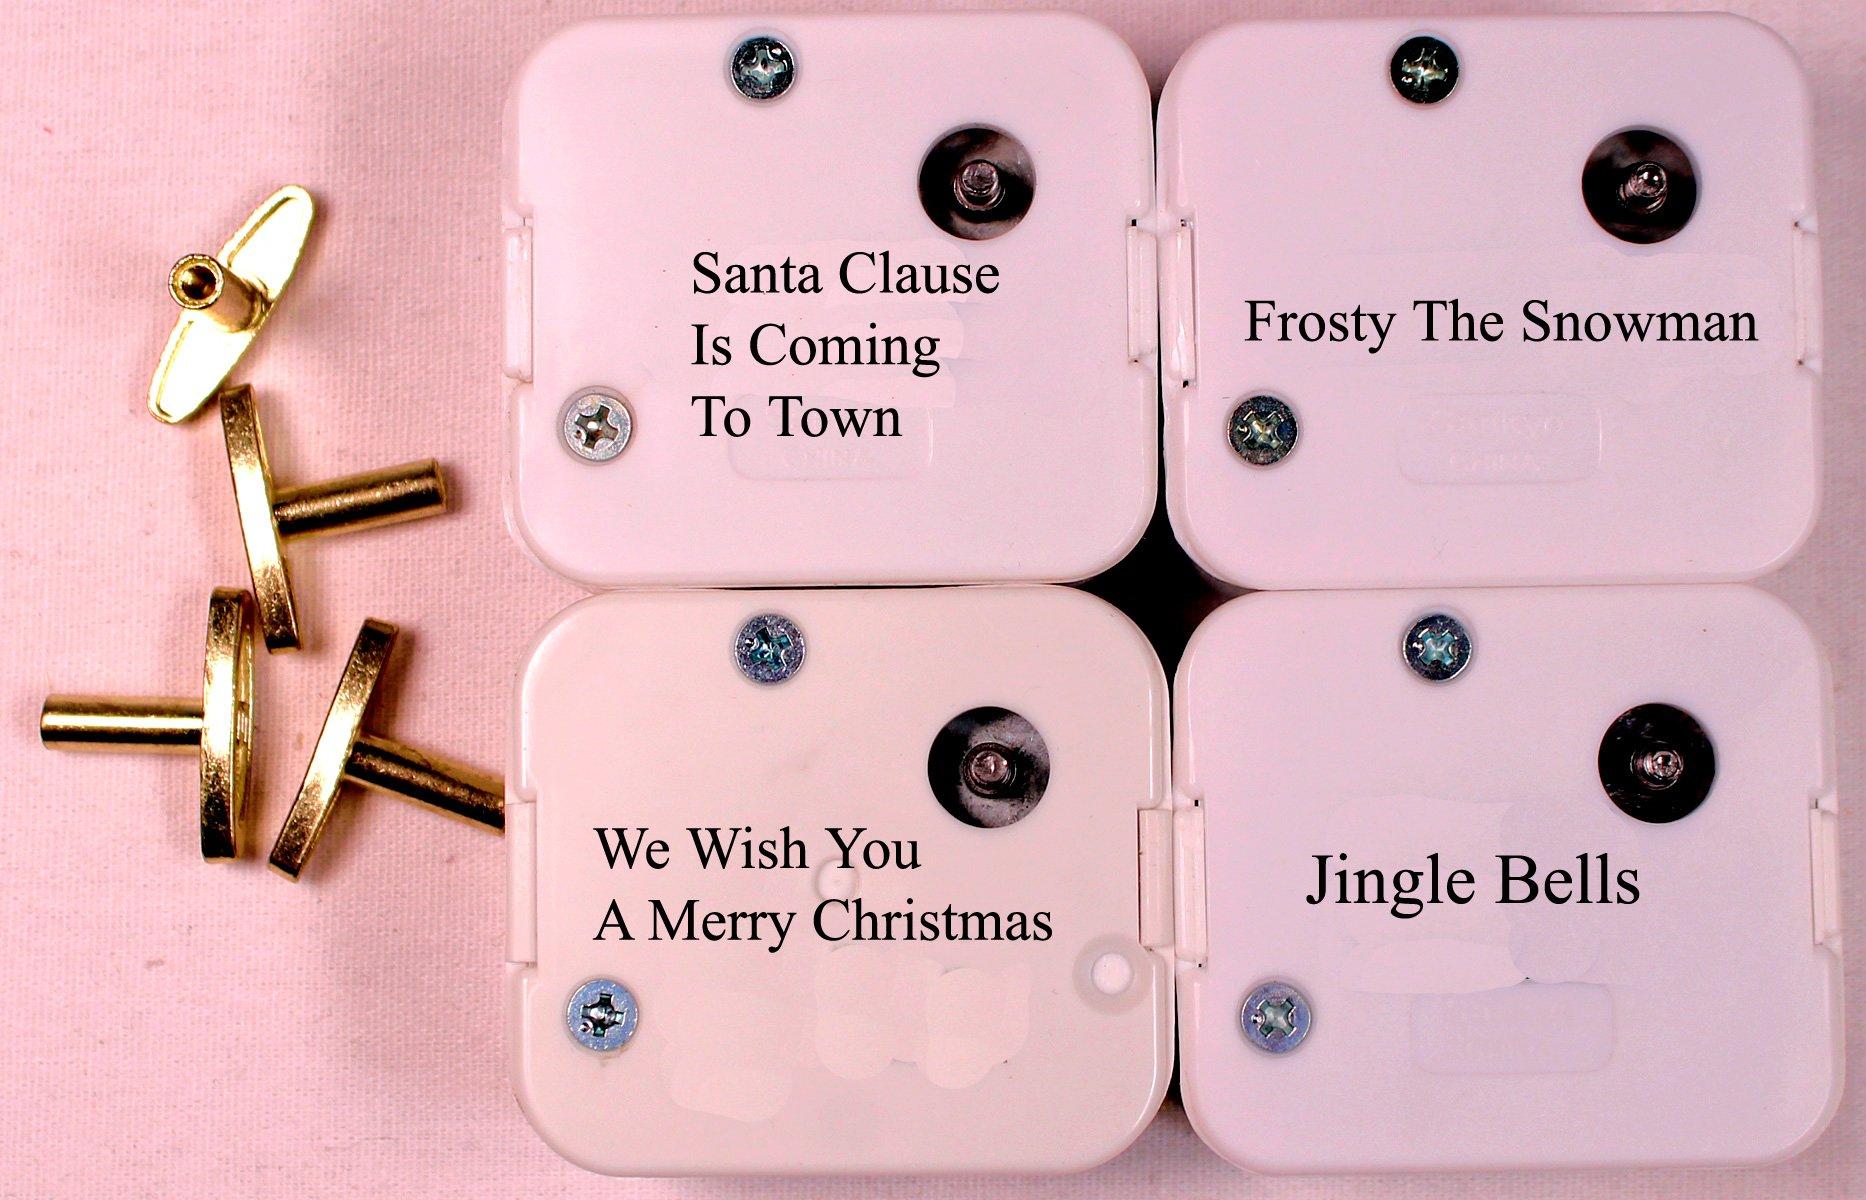 Creative Hobbies 4 Christmas Tunes Sankyo 18 Note Wind Up Music Box Musical Movements Winding Keys